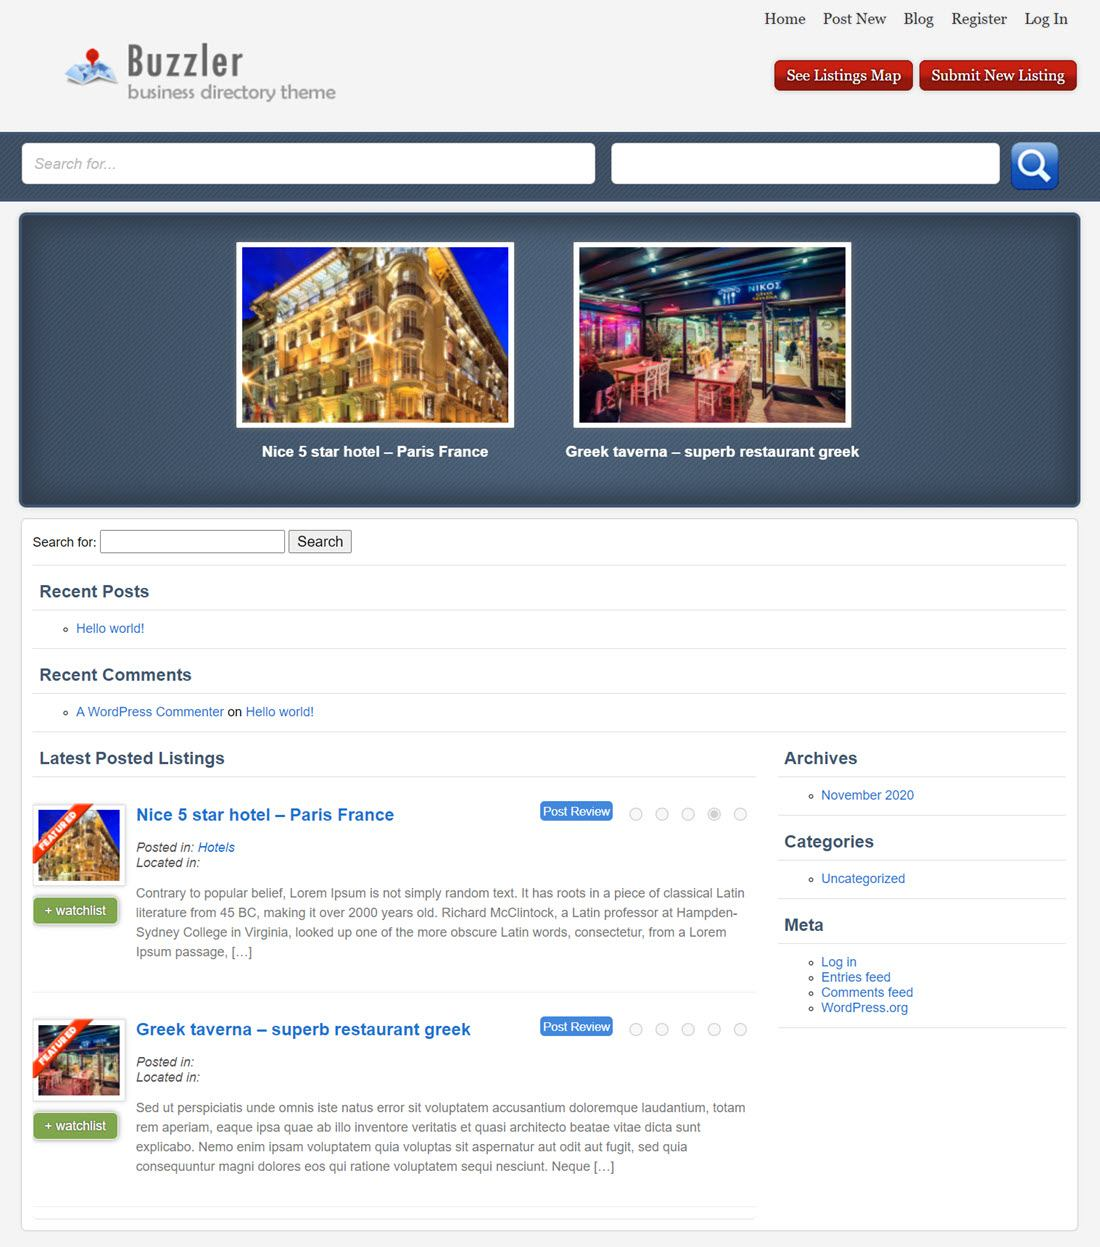 Buzzler Business Directory Theme Screenshot